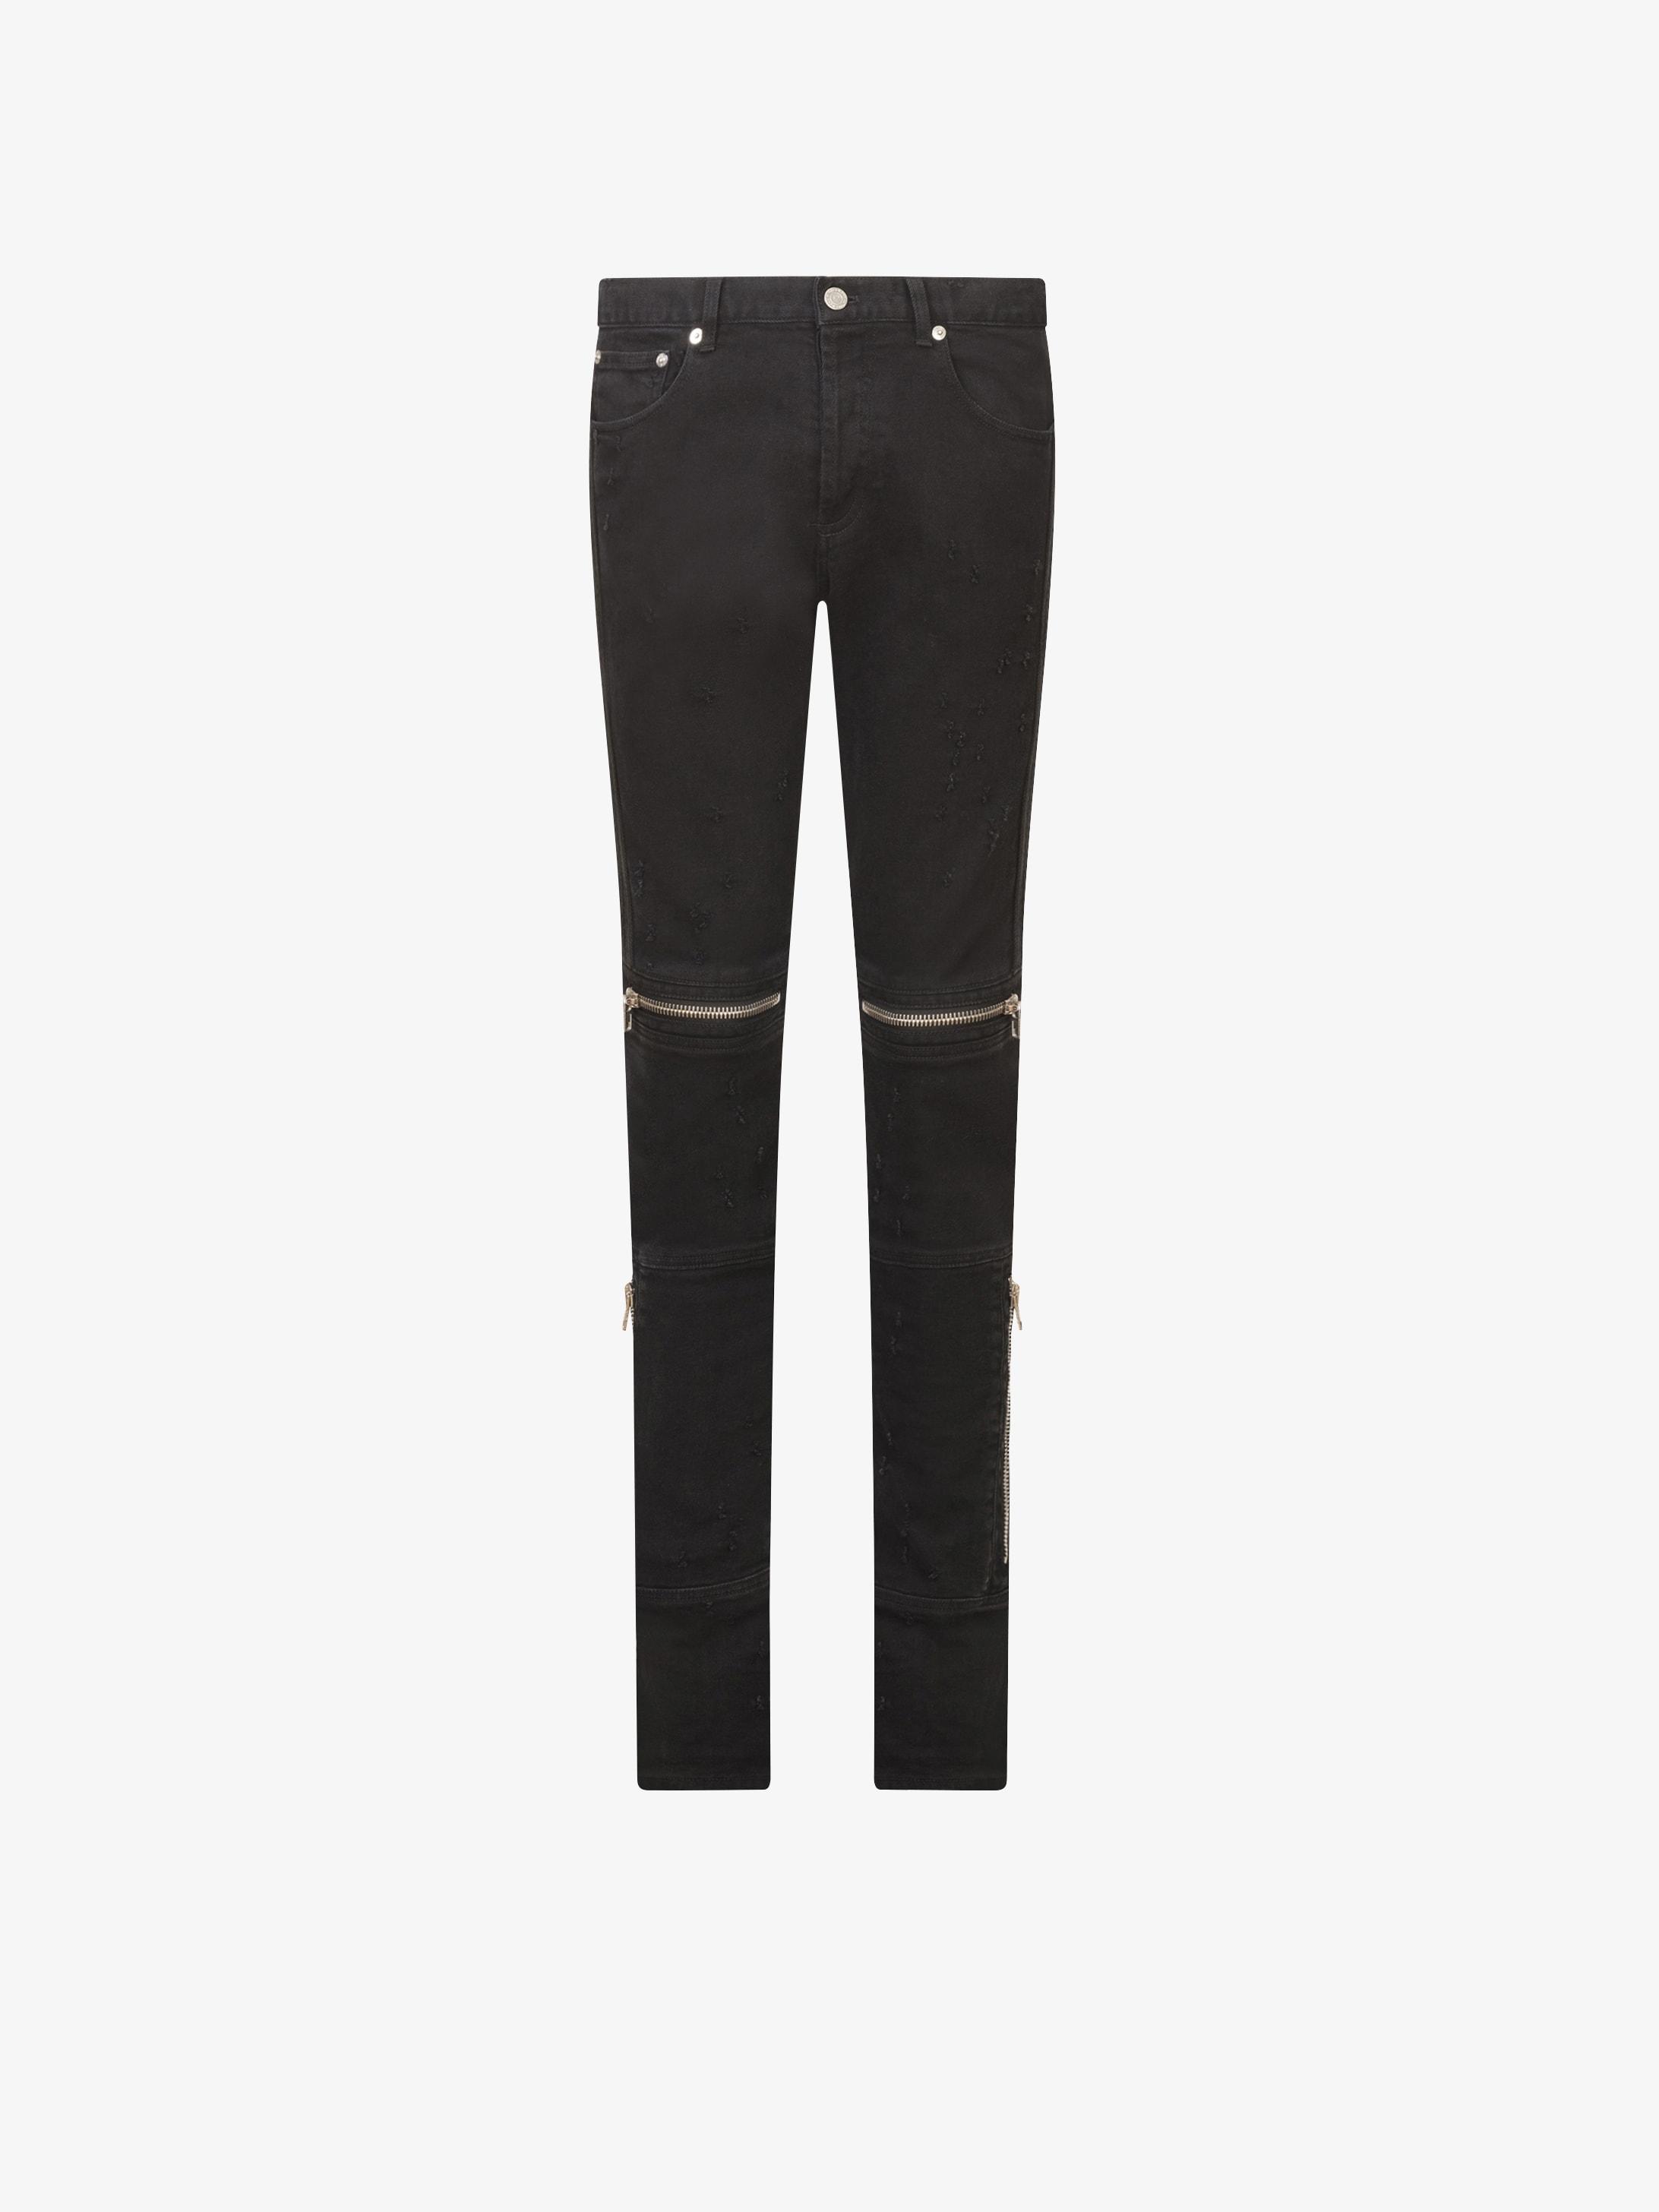 Jeans slim effet destroyed et zips